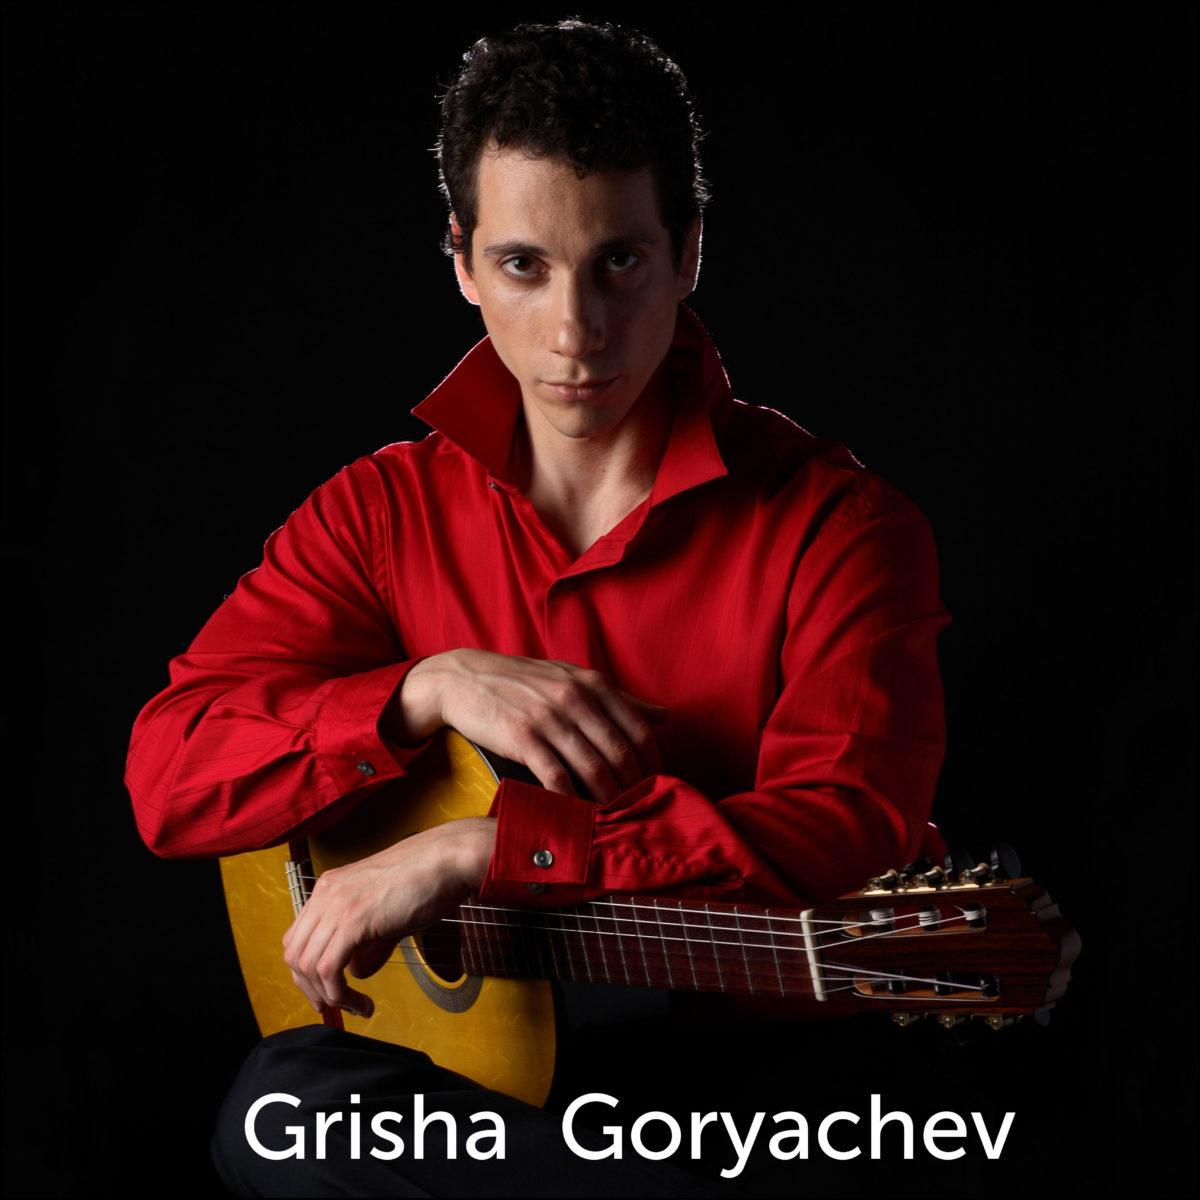 Grisha Goryachev